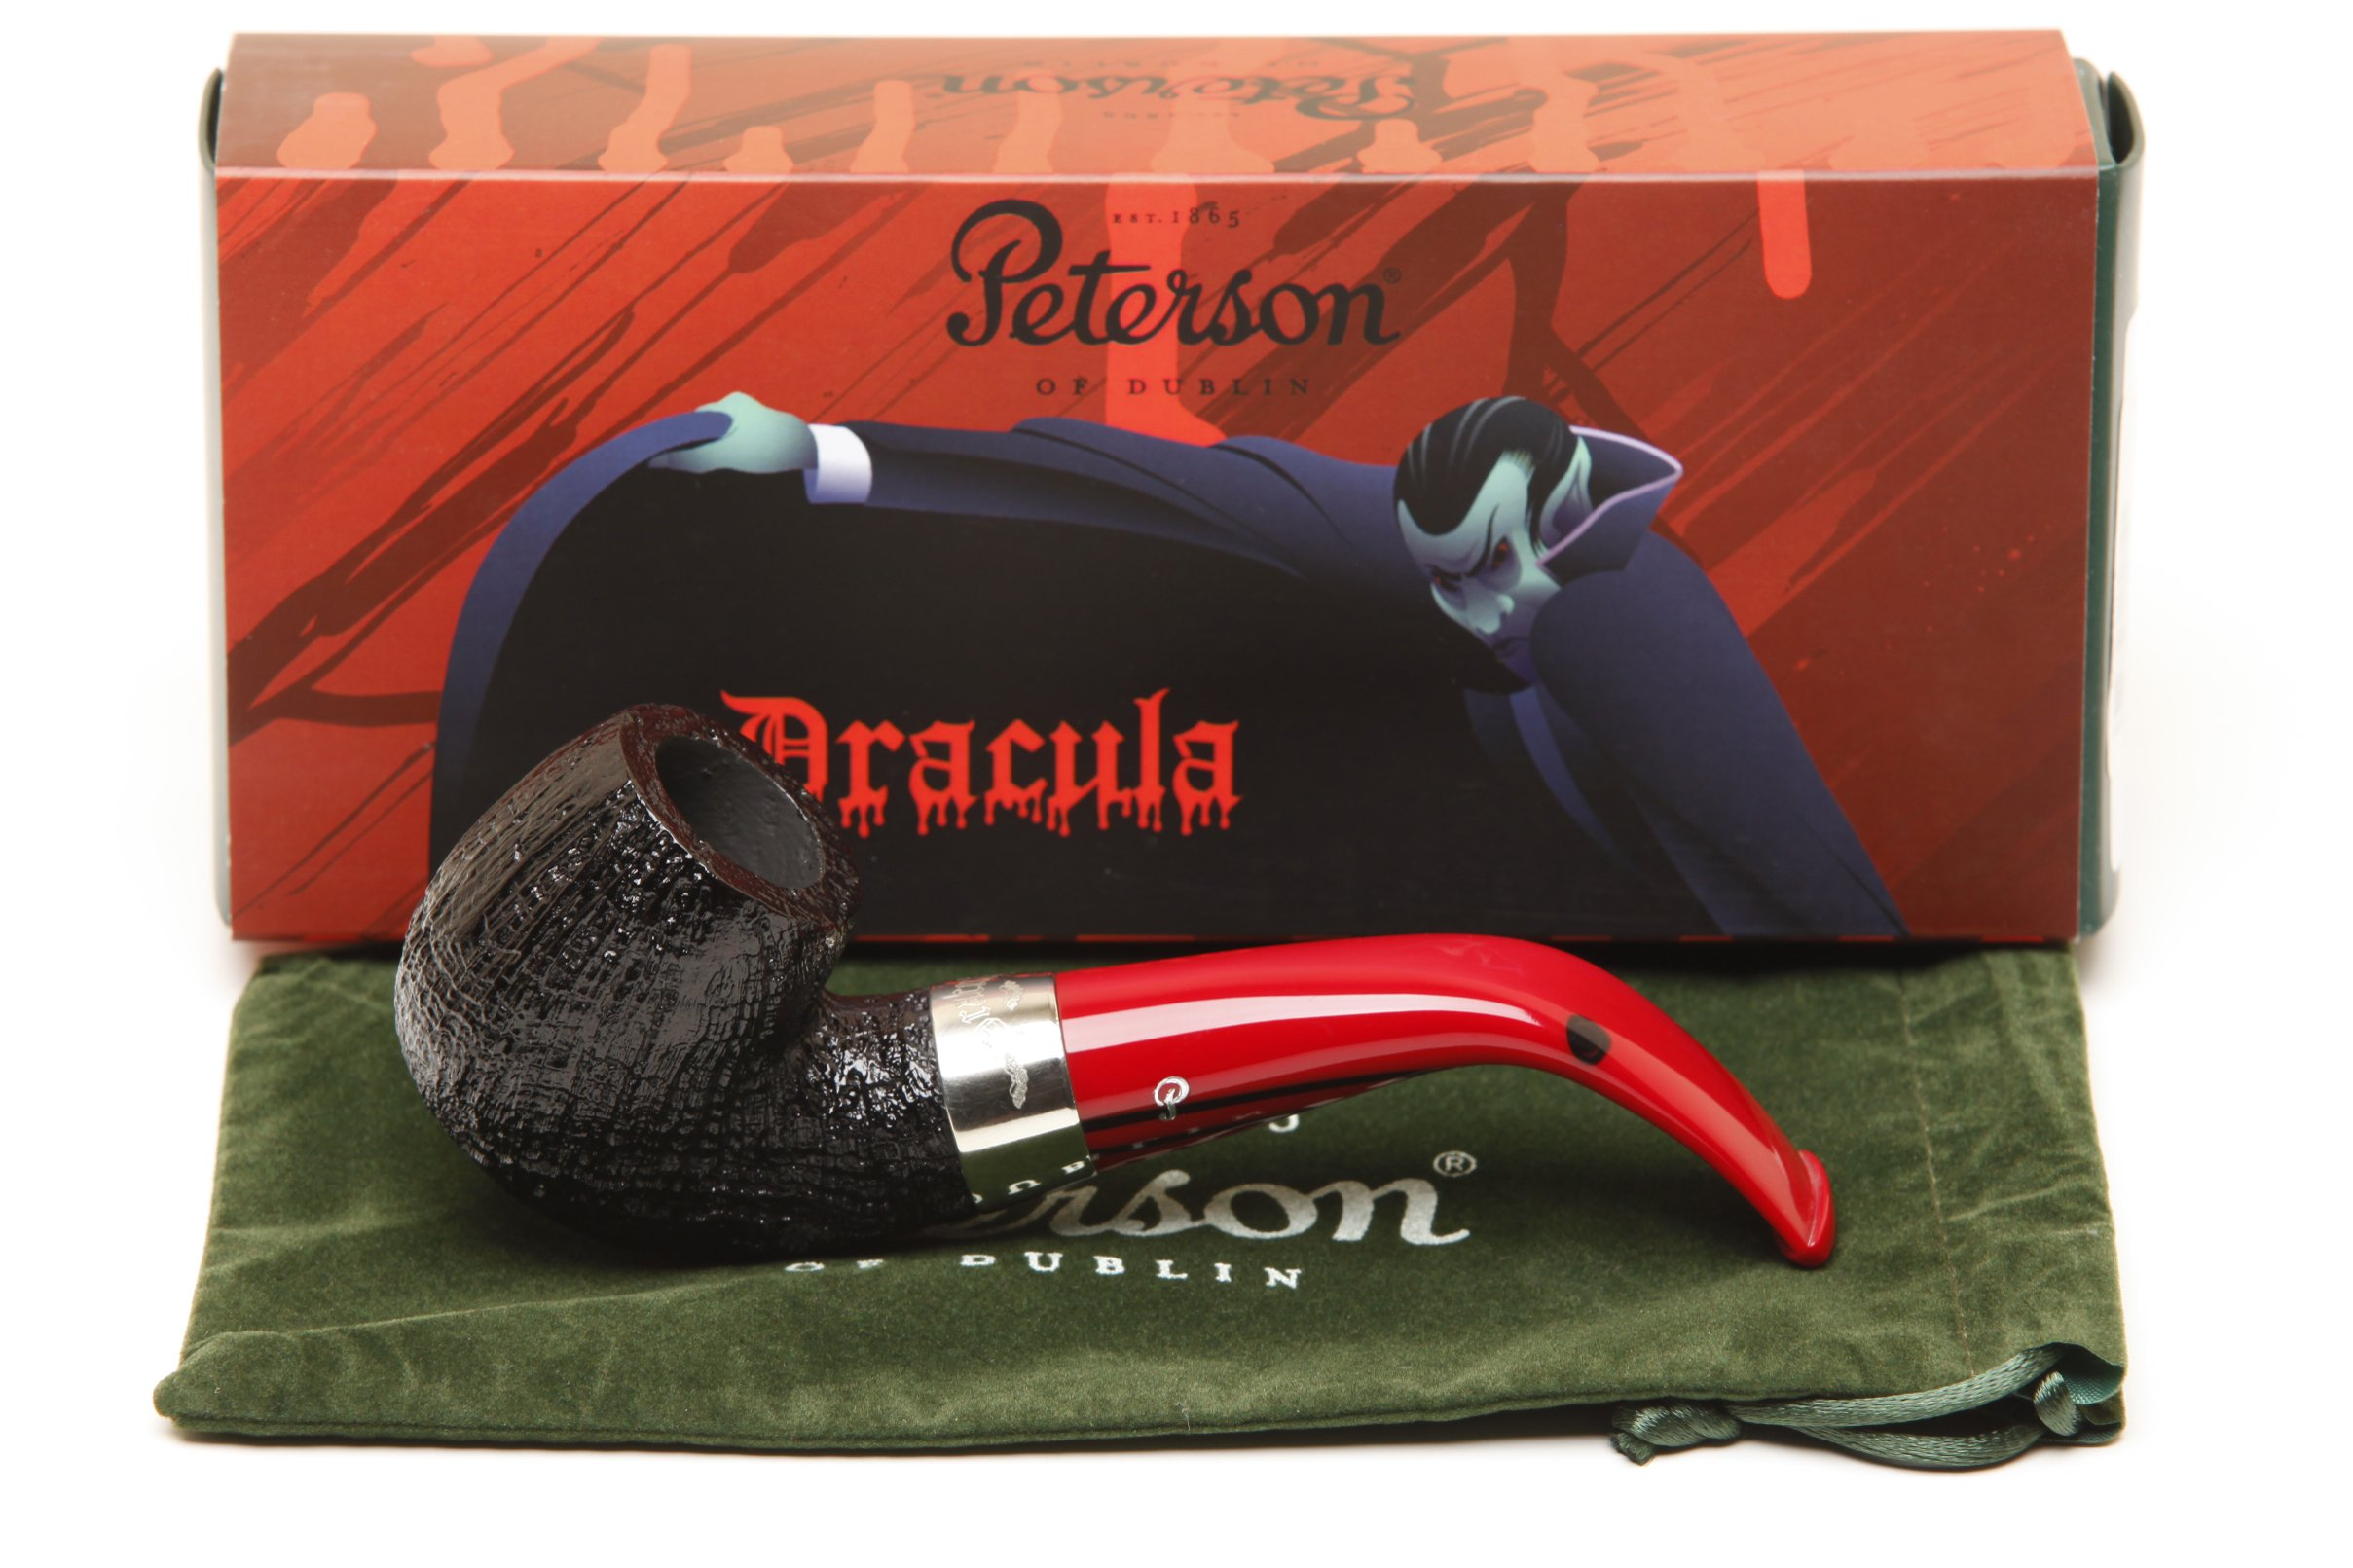 Peterson Dracula 221 Sandblast Fishtail Tobacco Pipe